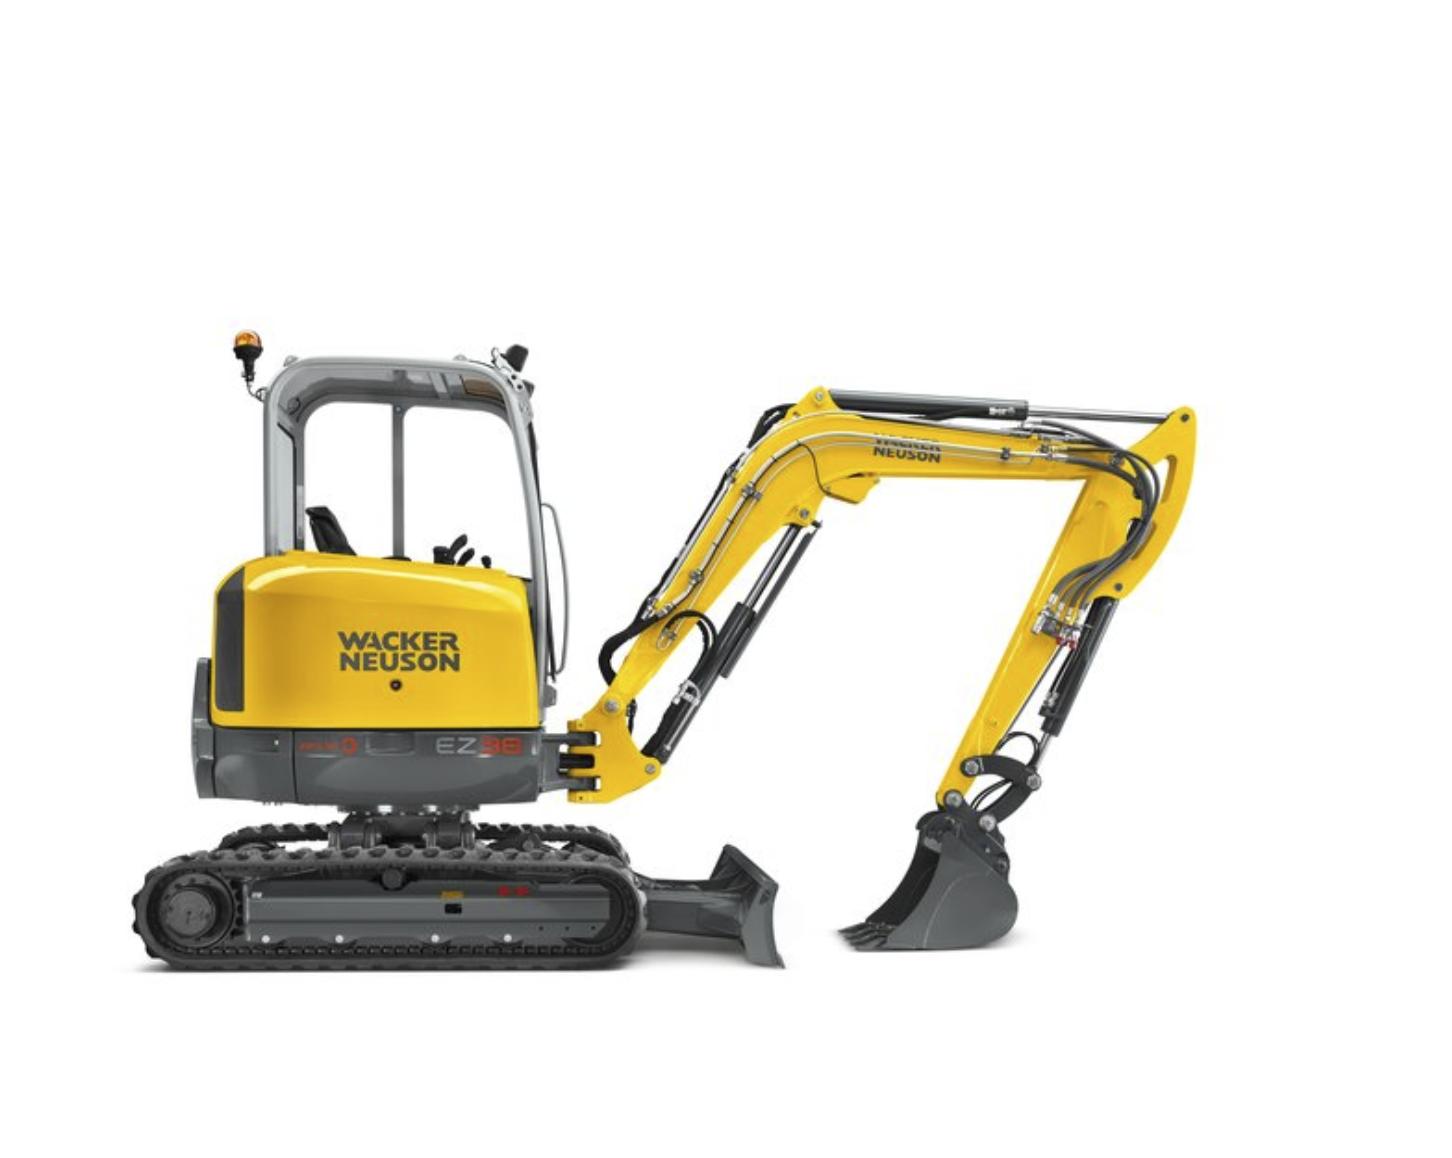 Mini Excavator 68.5 inch 3.8 tonne Image